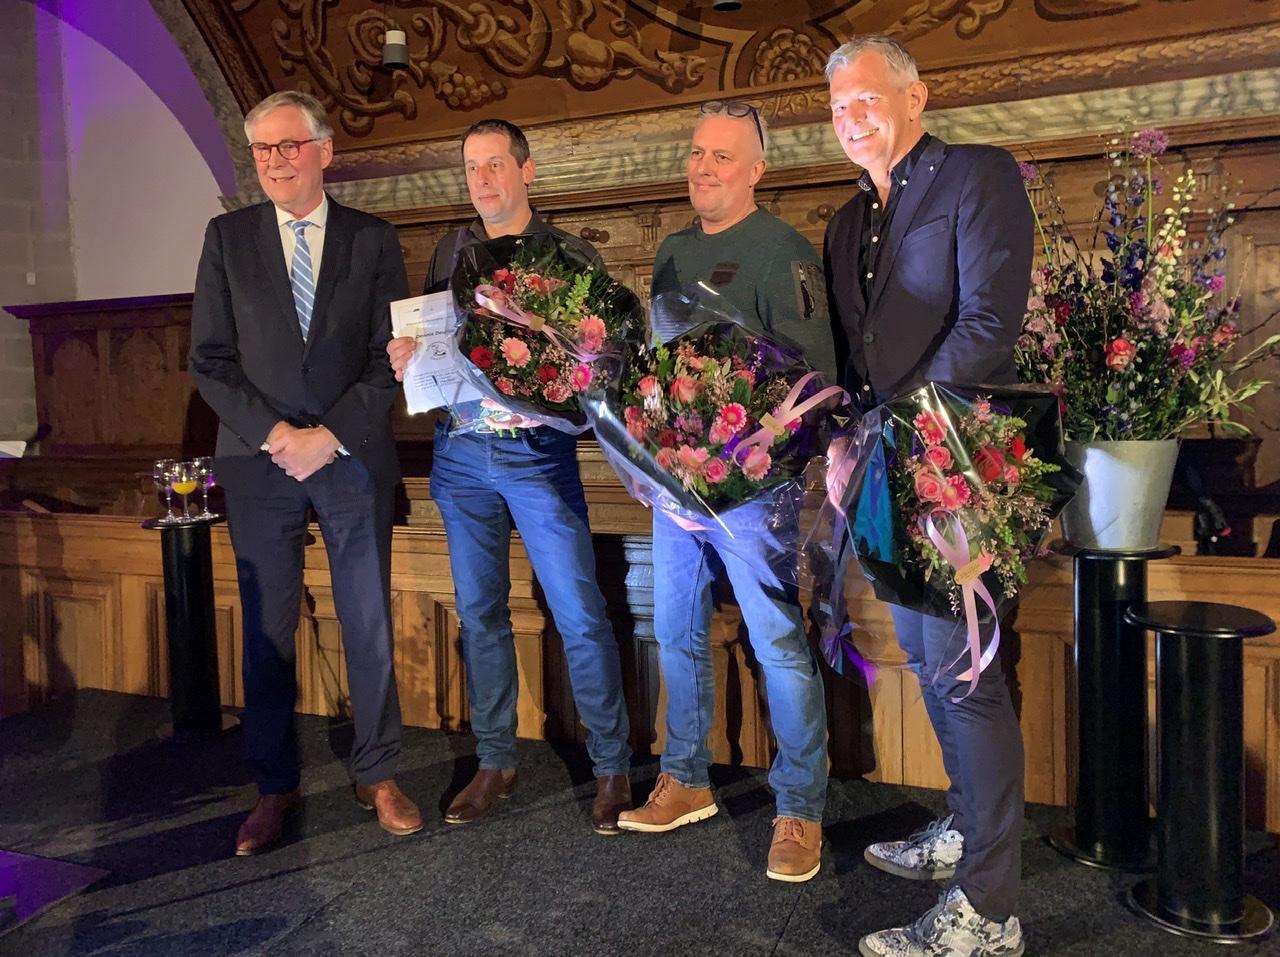 Verkiezing Brielse Ondernemersprijs 2021 van start